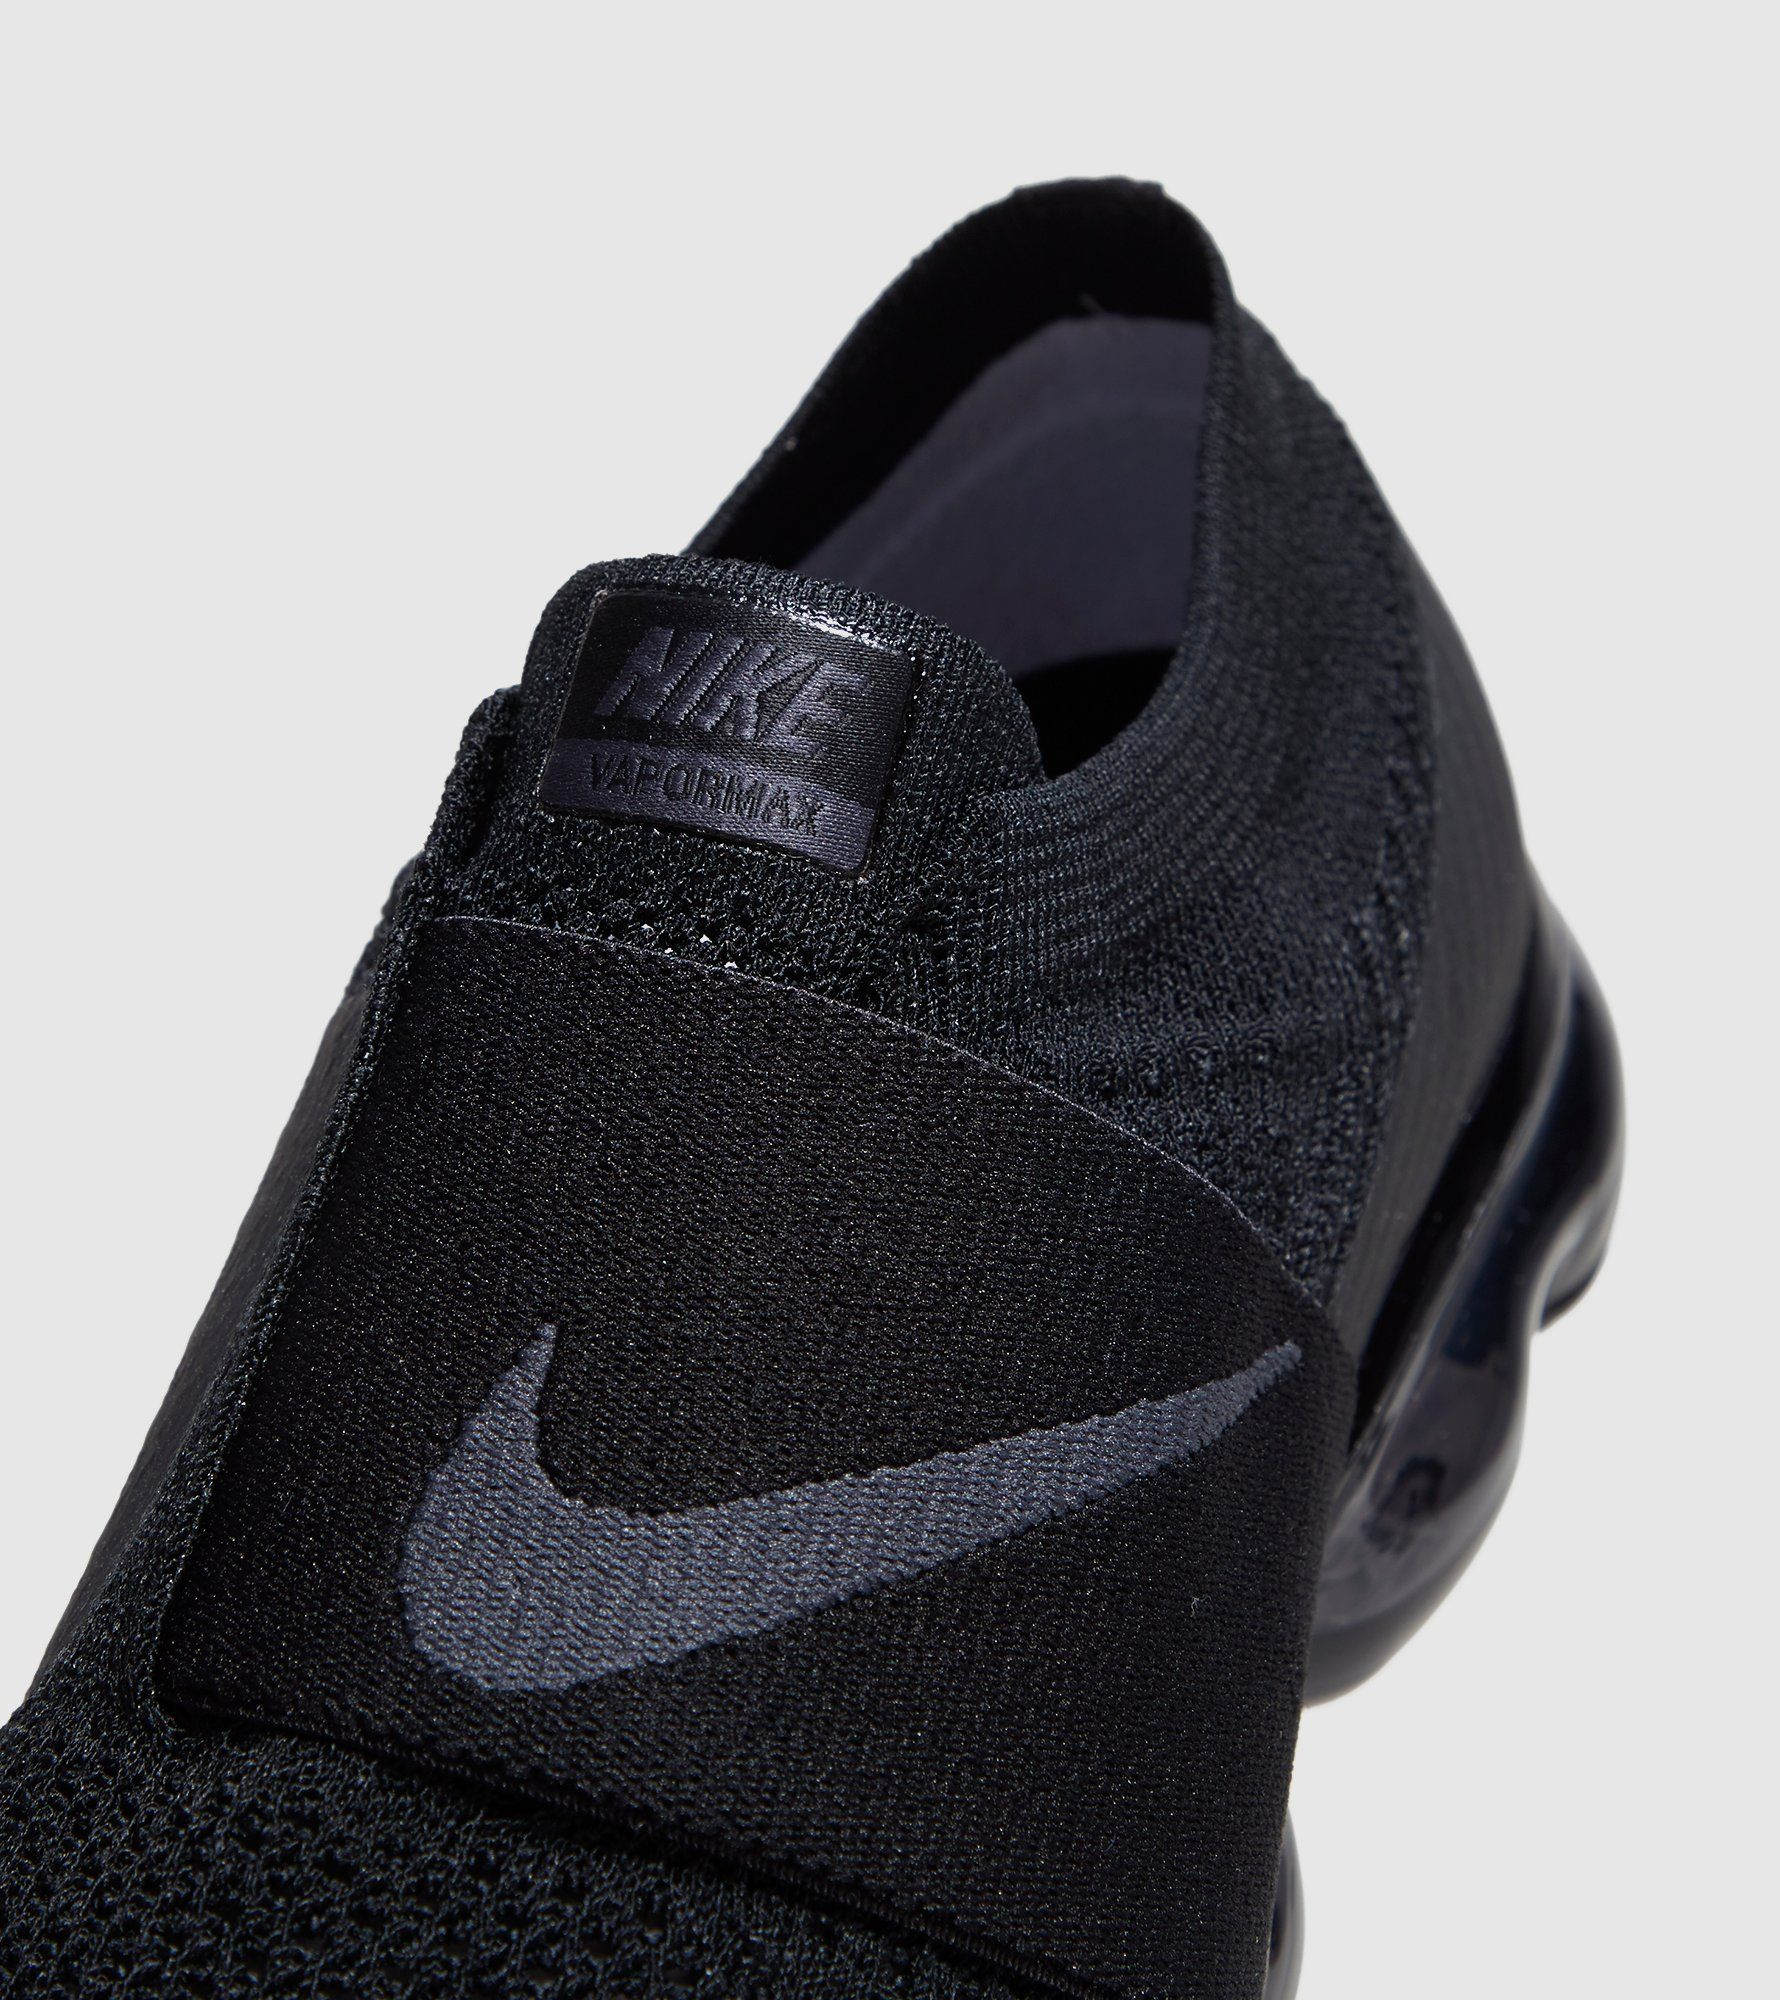 Nike Air VaporMax Flyknit Moc Women's